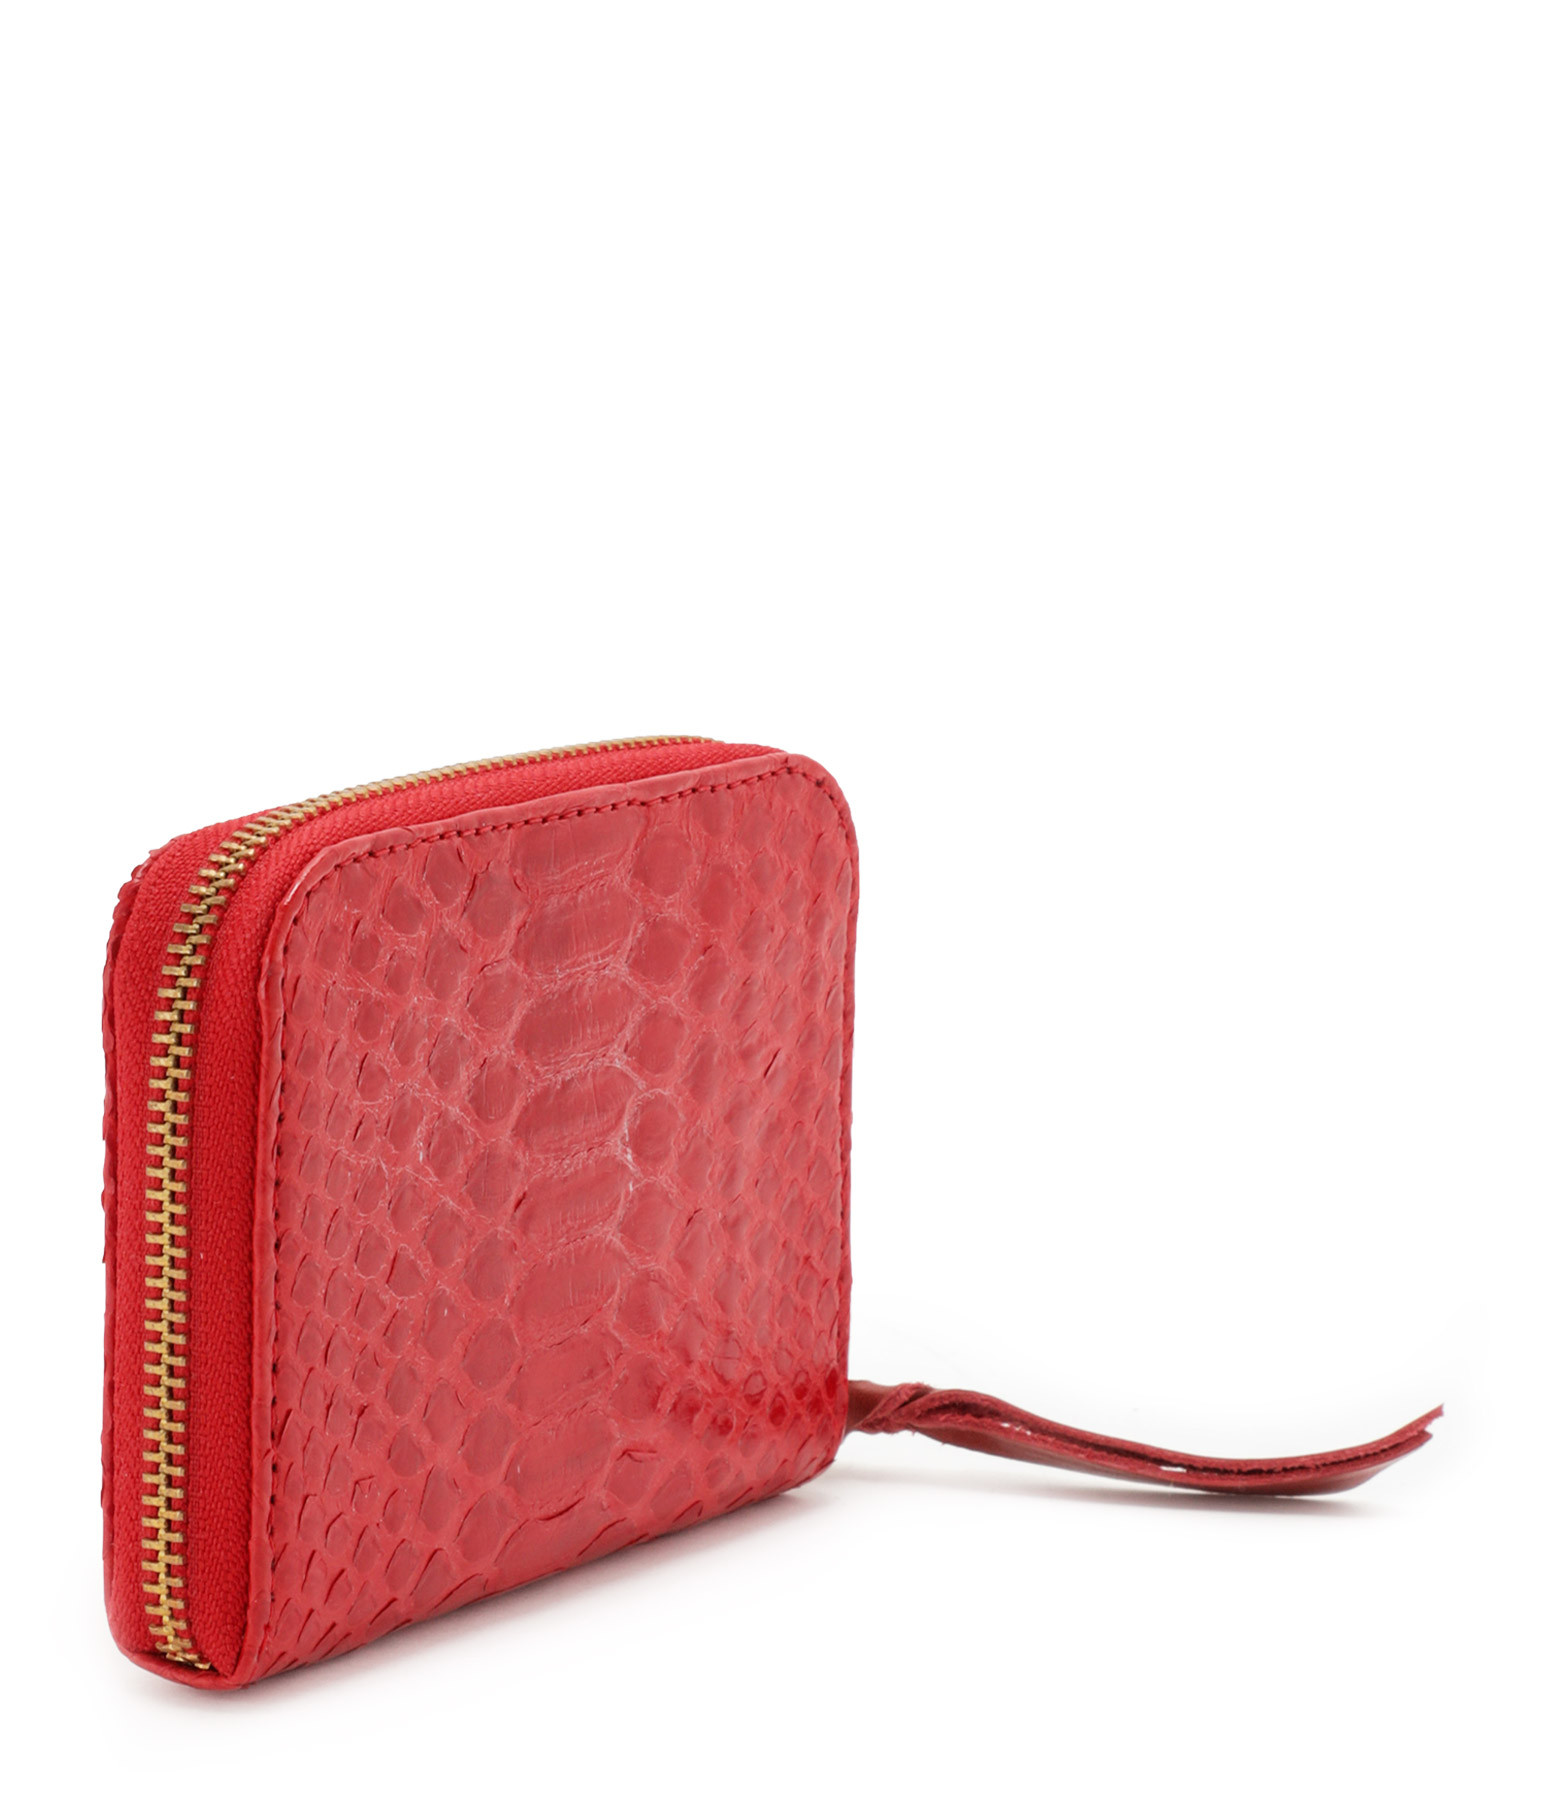 CLARIS VIROT - Porte-monnaie Mini Bob Python Rouge